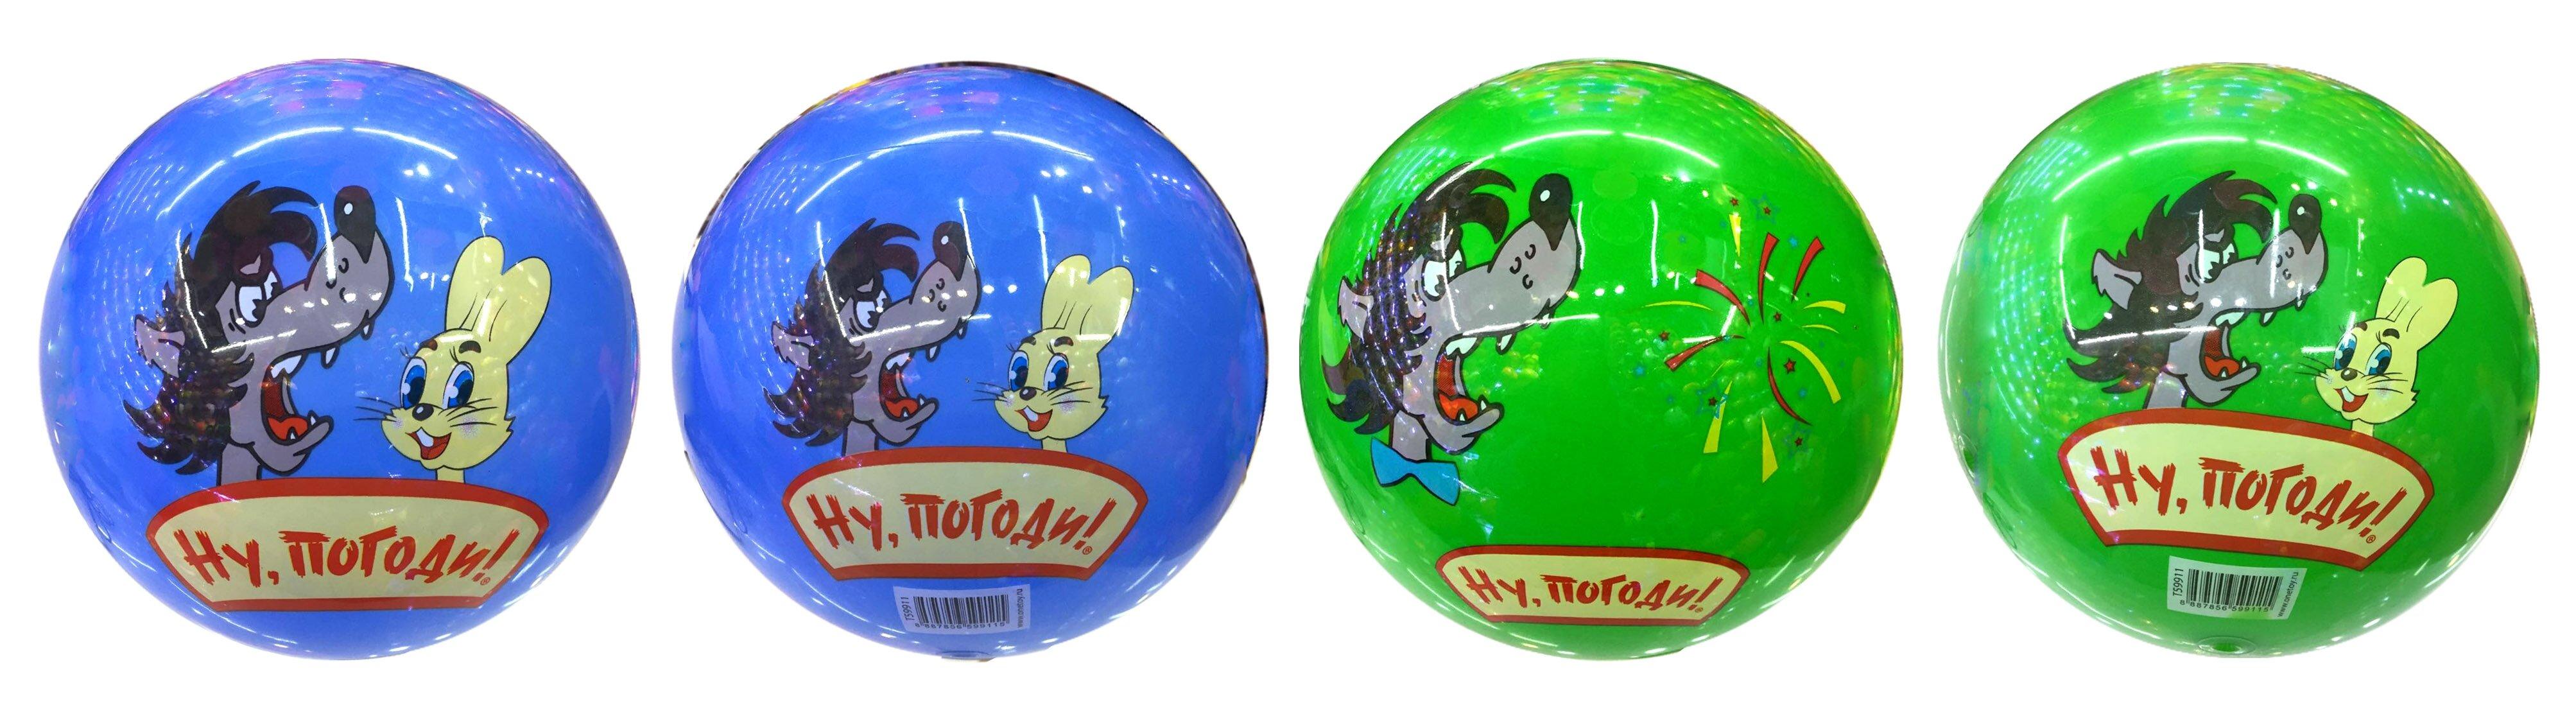 "Мяч 1 TOY ""Ну погоди!"" 23 см."